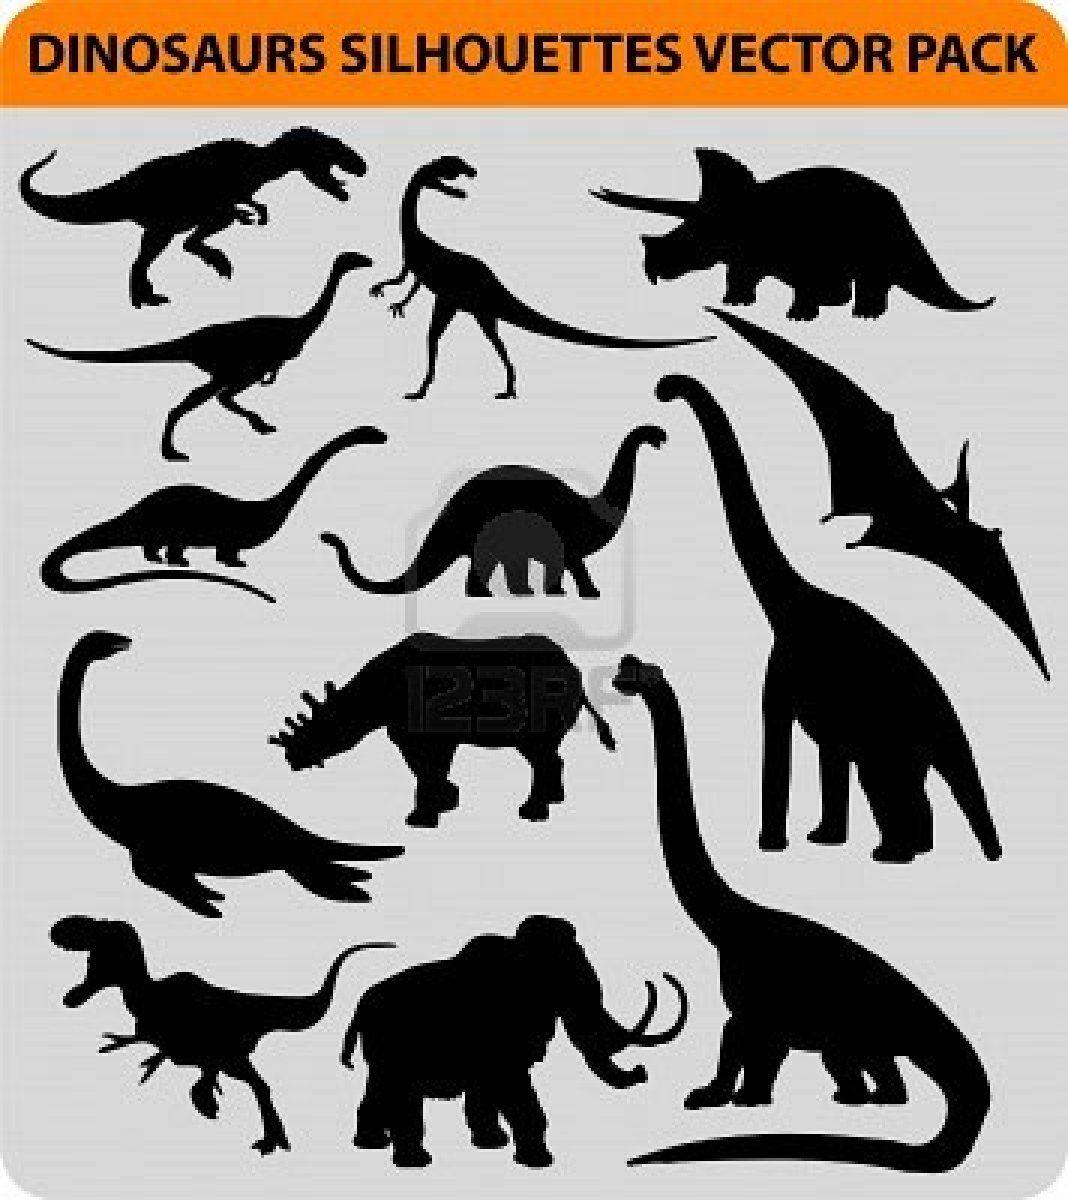 Dinosaur Silhouettes With Images Dinozaur Dinozaury Zwierzeta